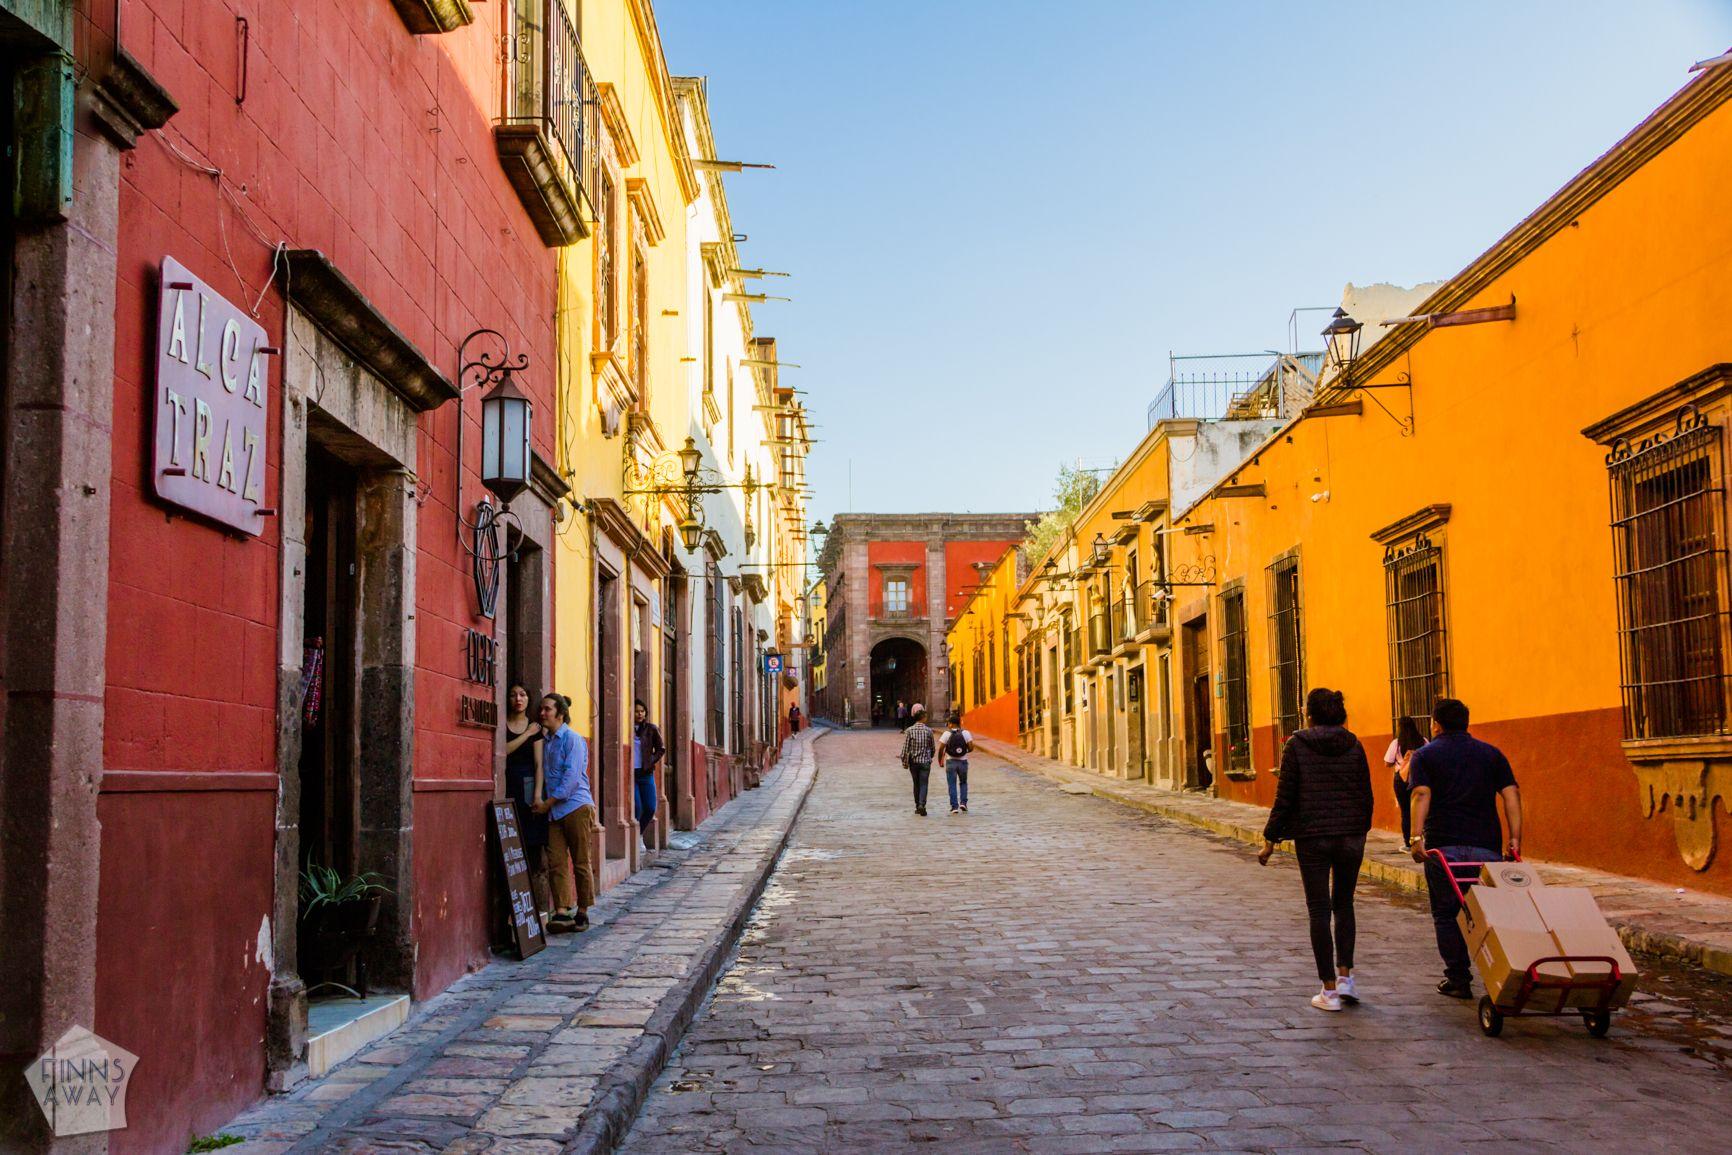 On the alleys of San Miguel de Allende | FinnsAway Travel Blog